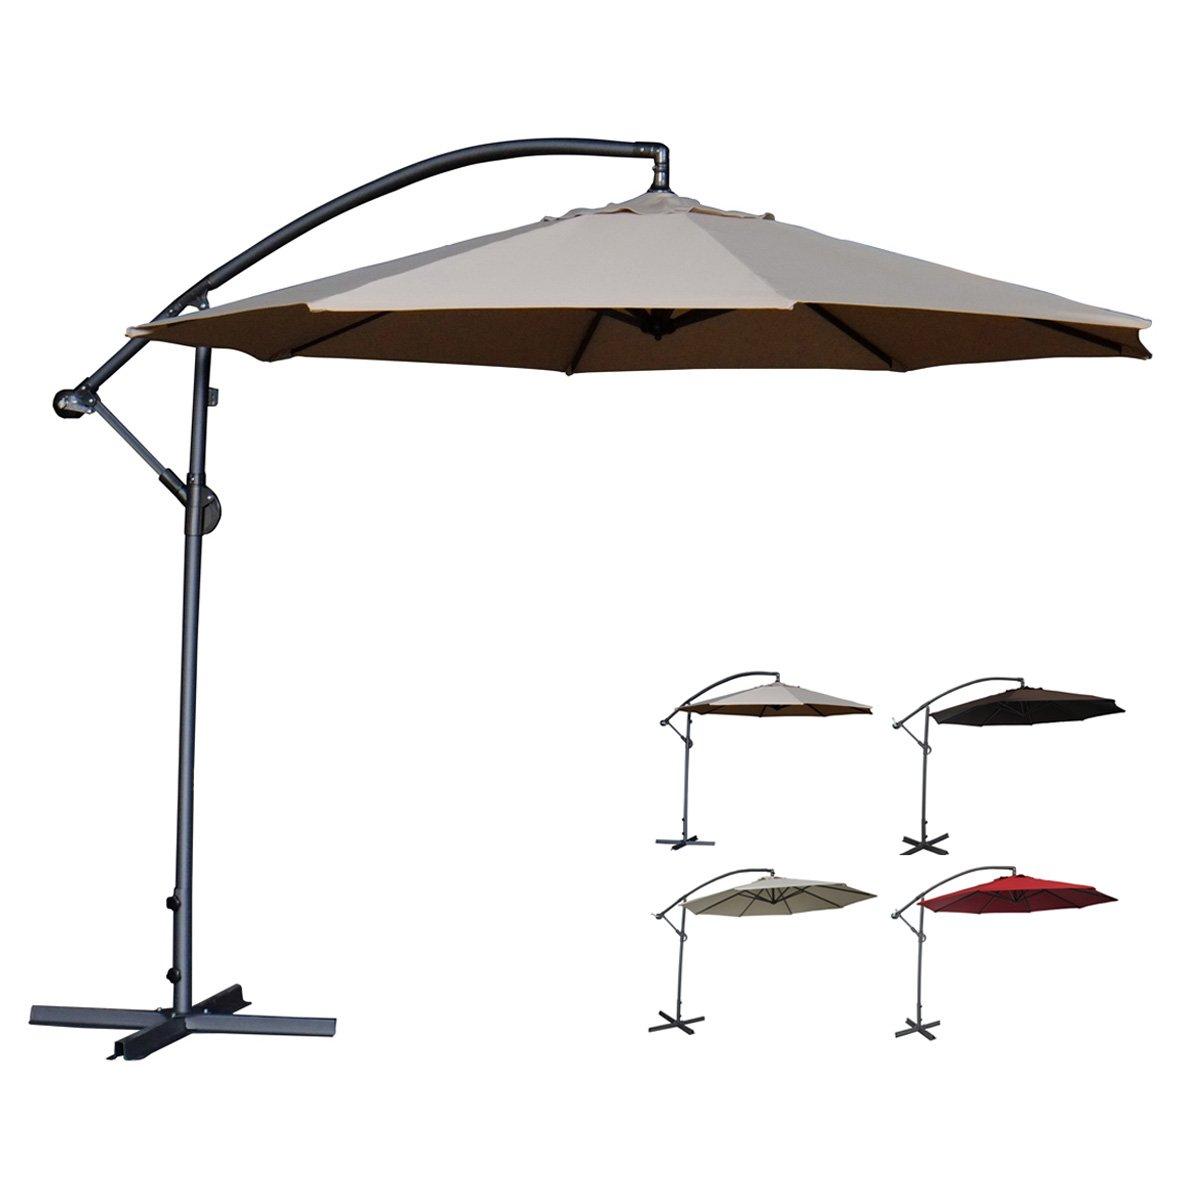 Patio Umbrella Replacement Parts: 61jufRcIVjL._SL1200_.jpg